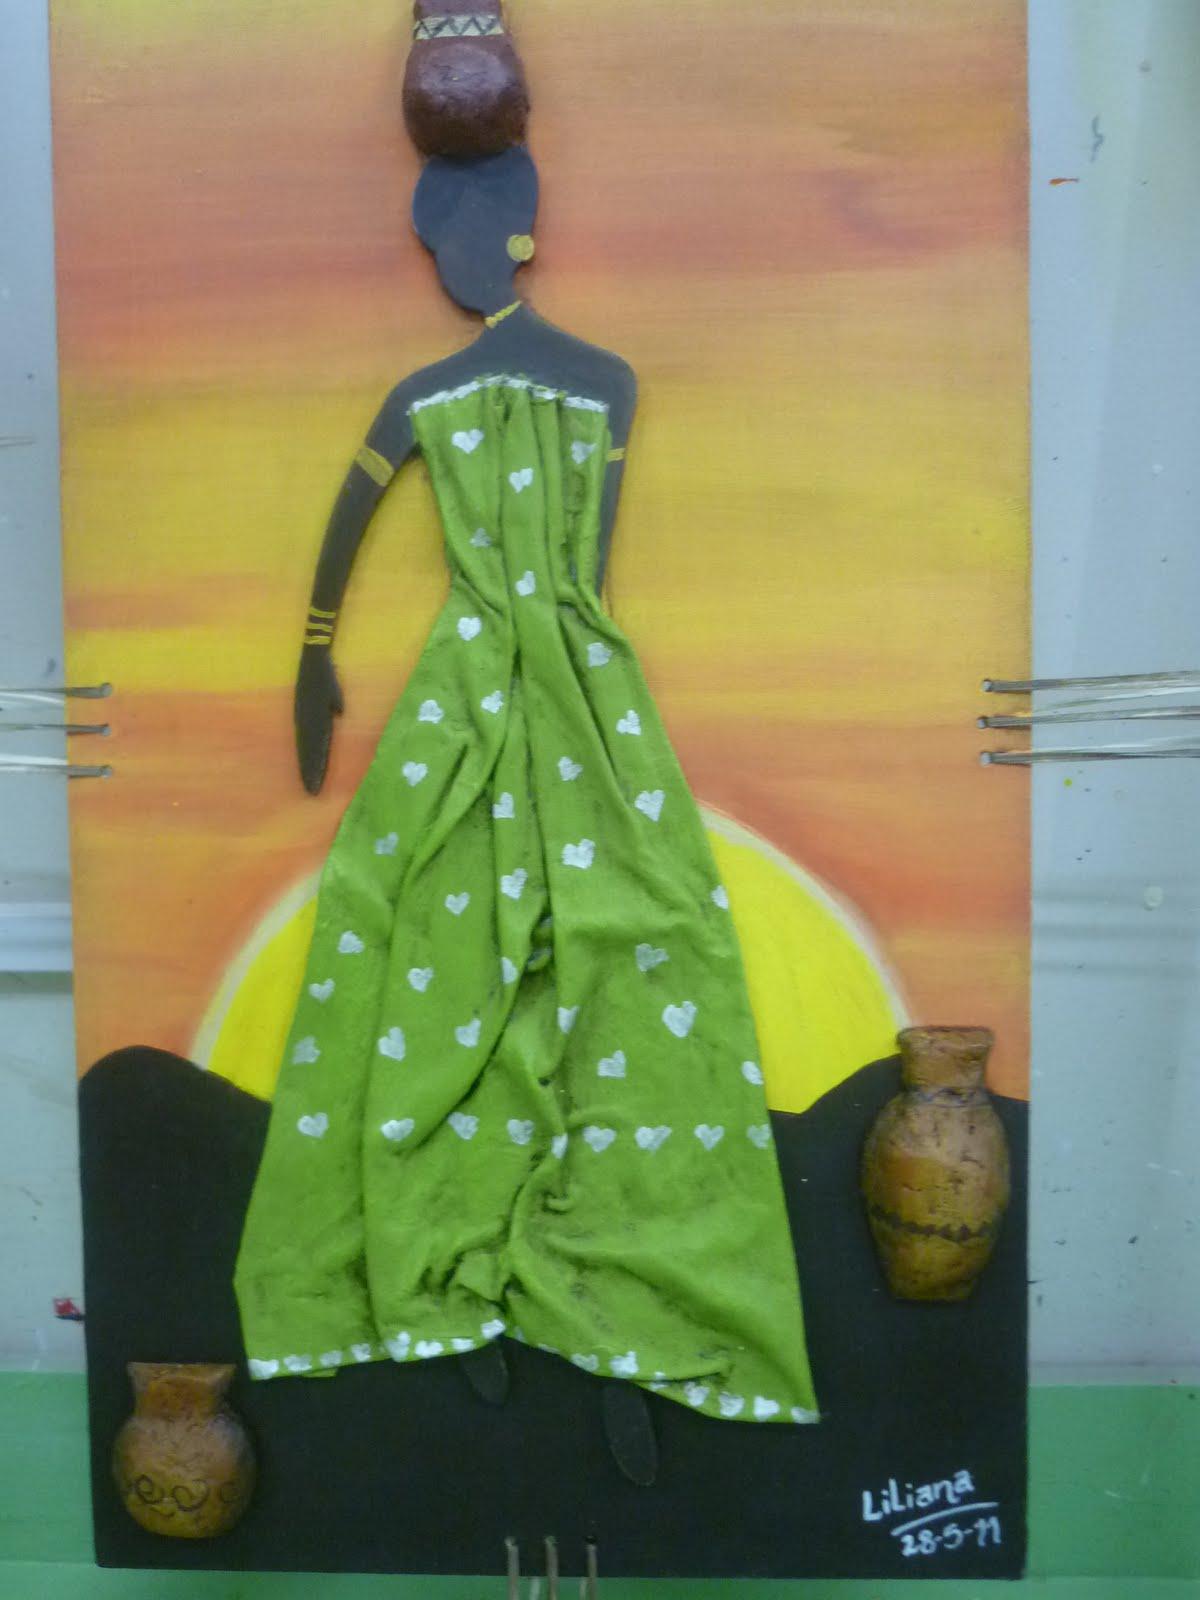 CREACIONES DE SILVIA: Negrita de Liliana L.